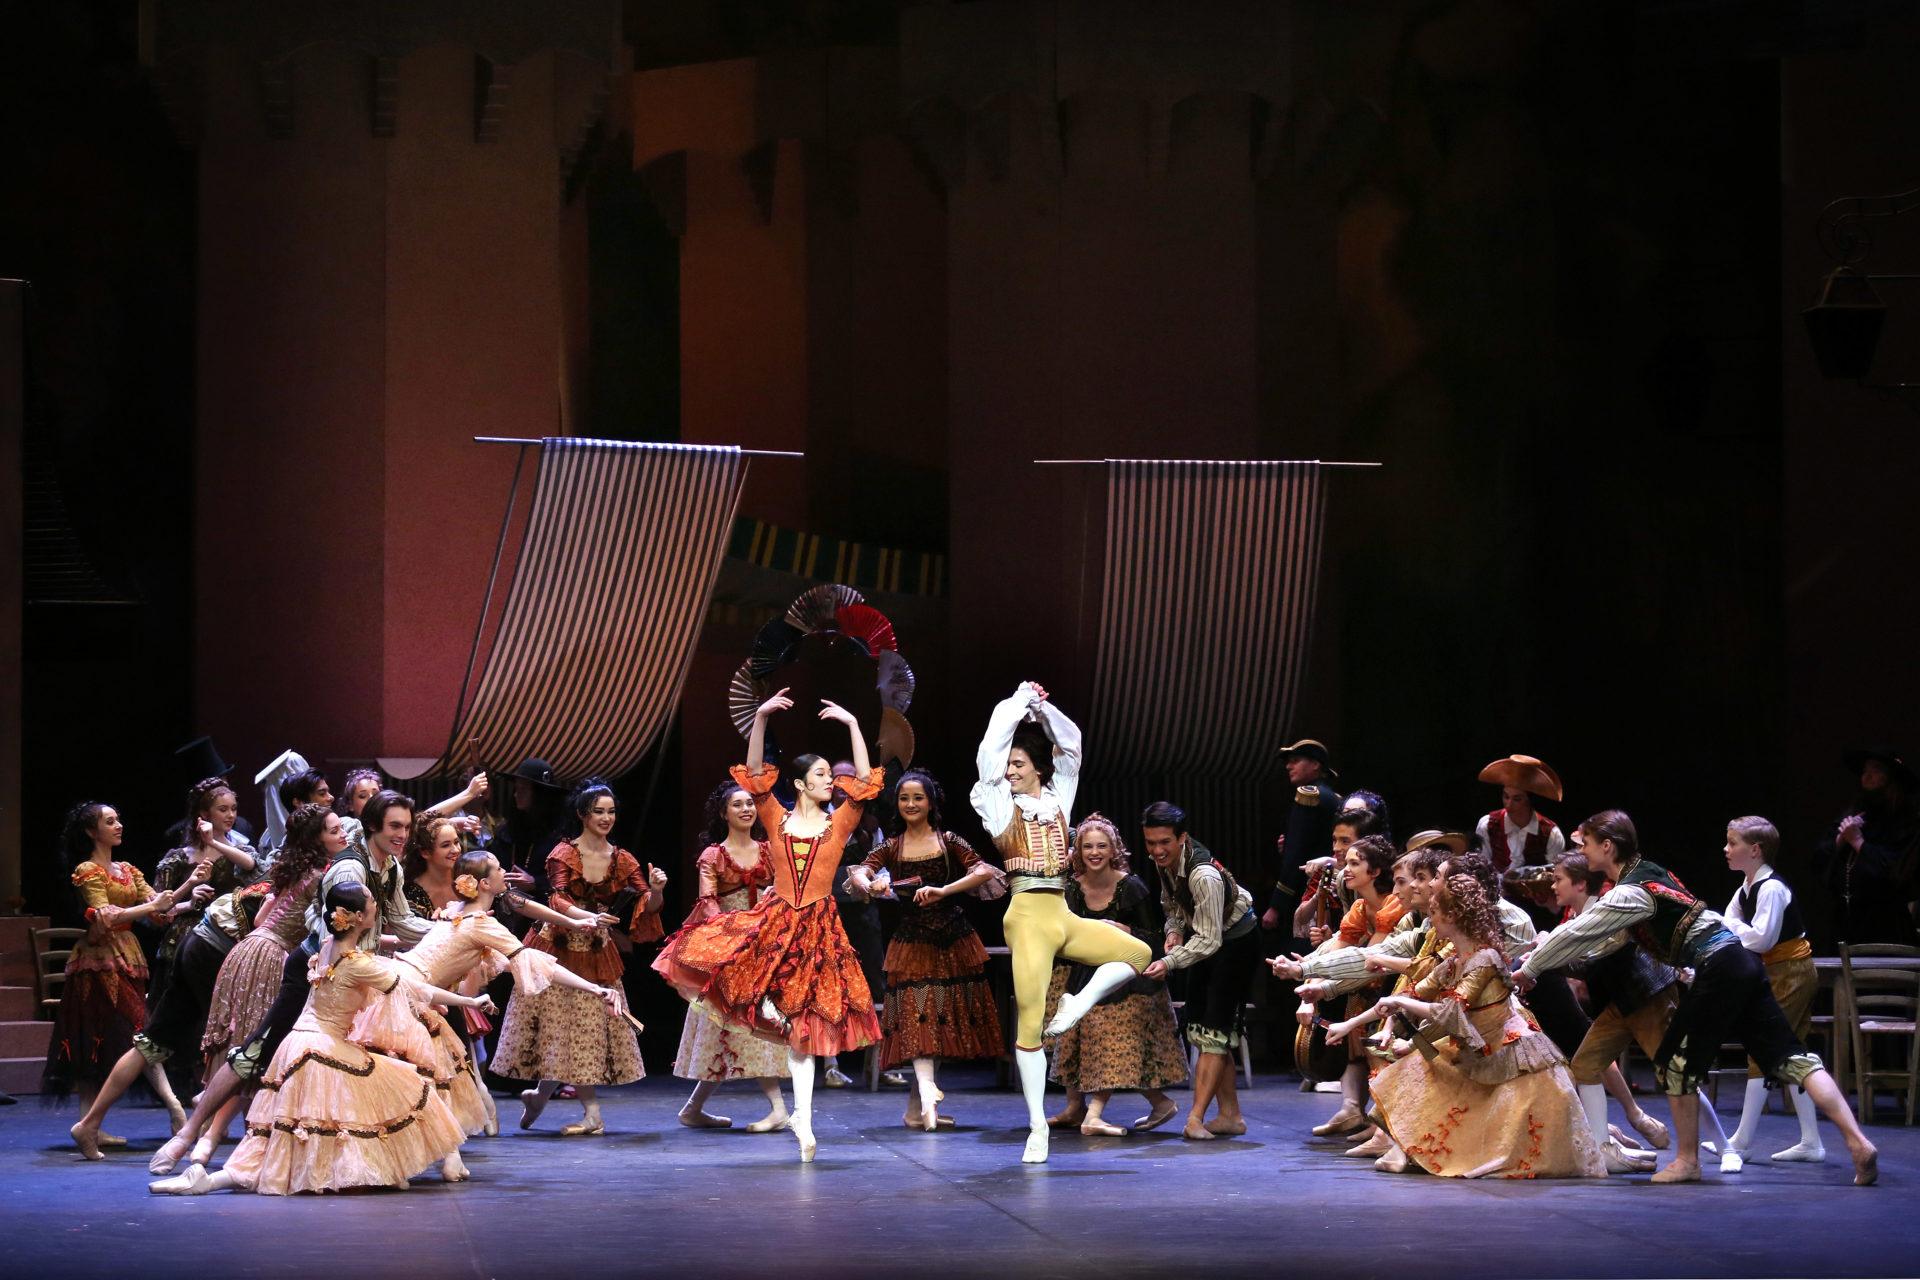 Don_Quixote_HH_Ballett_Foto_AnjaBeutler.de_061